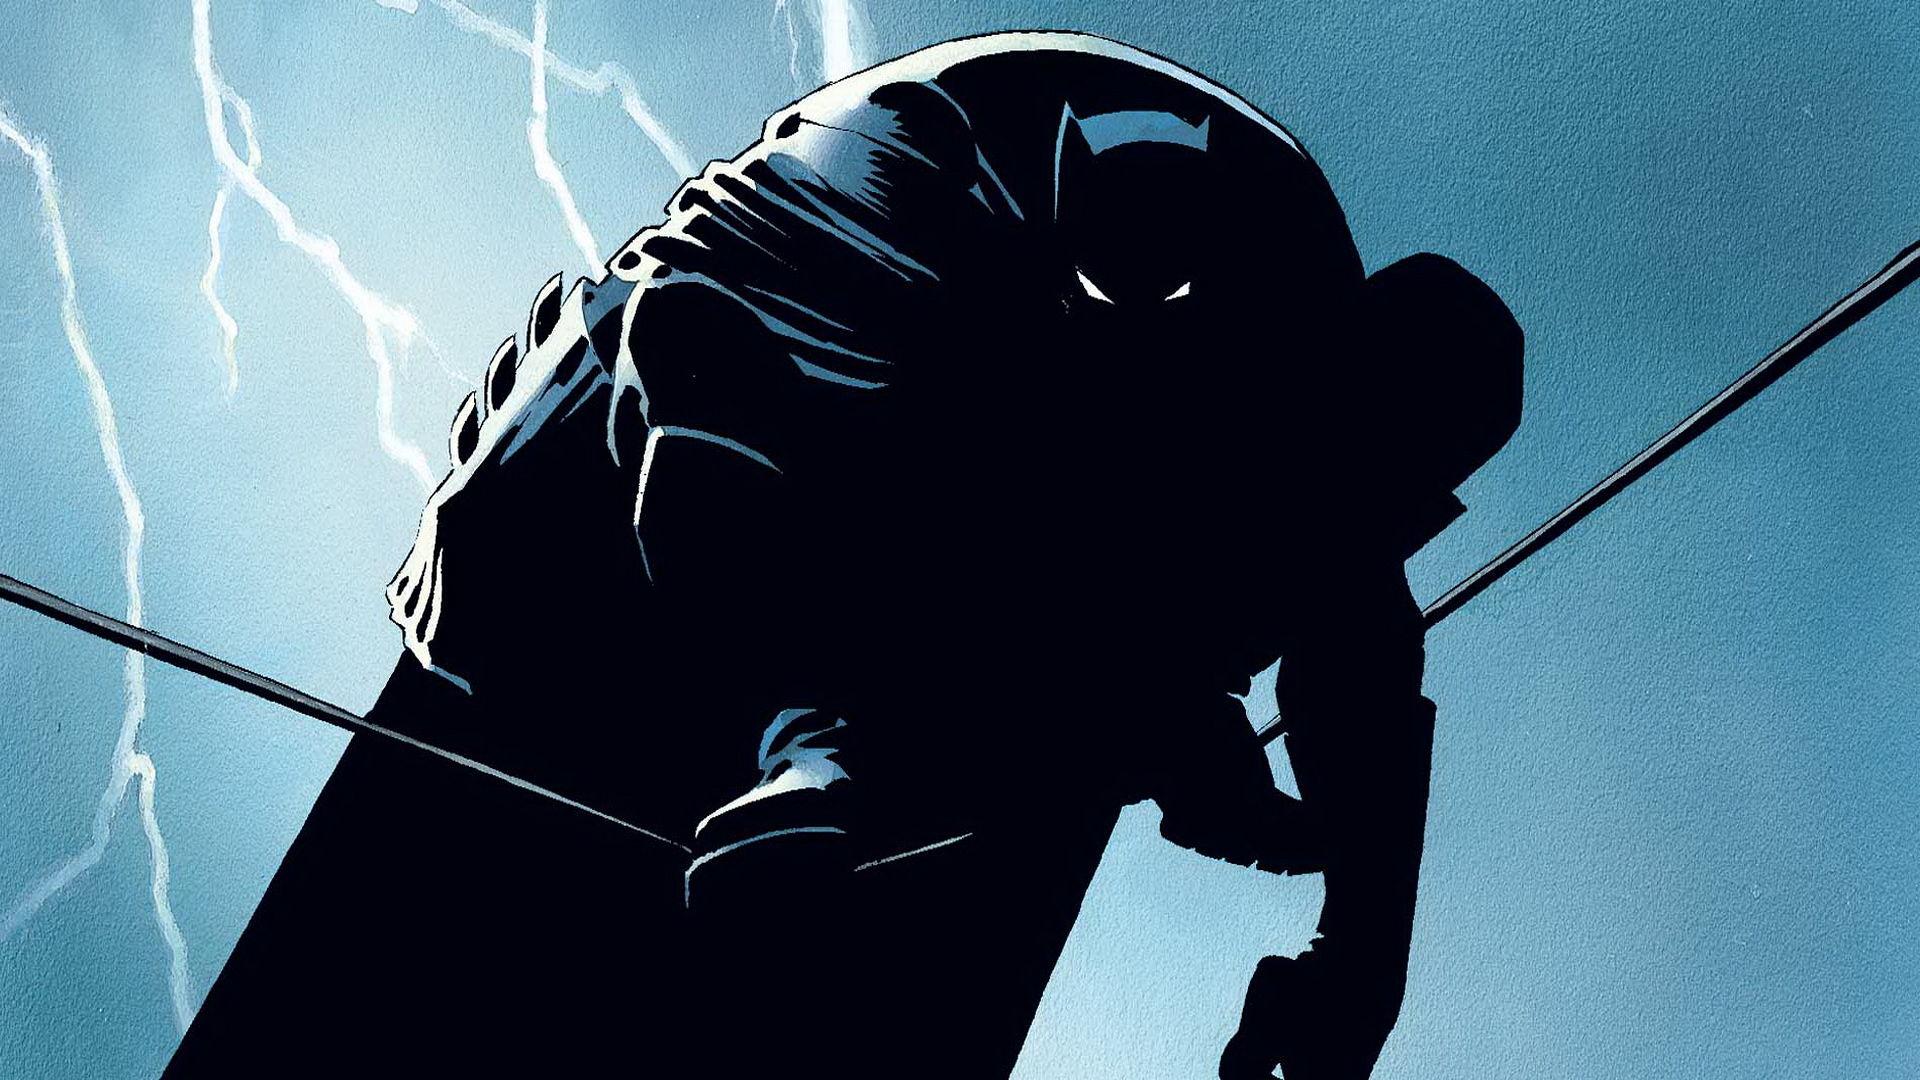 Free Download The Dark Knight Returns Good Material For Batman V